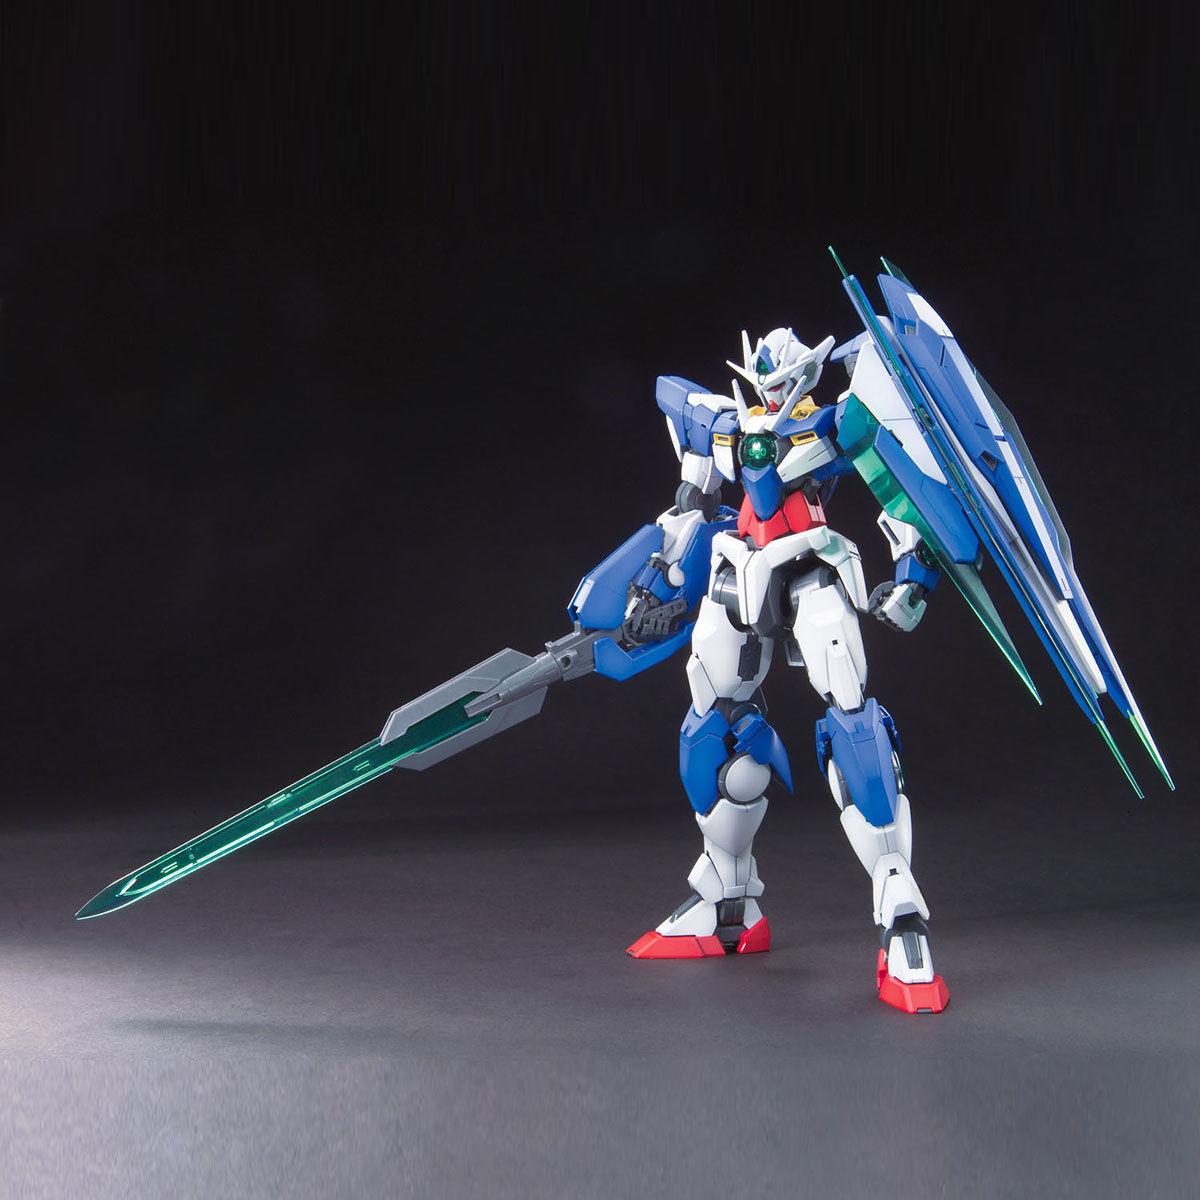 MG 00 Quan[T] 1/100 (Bandai)